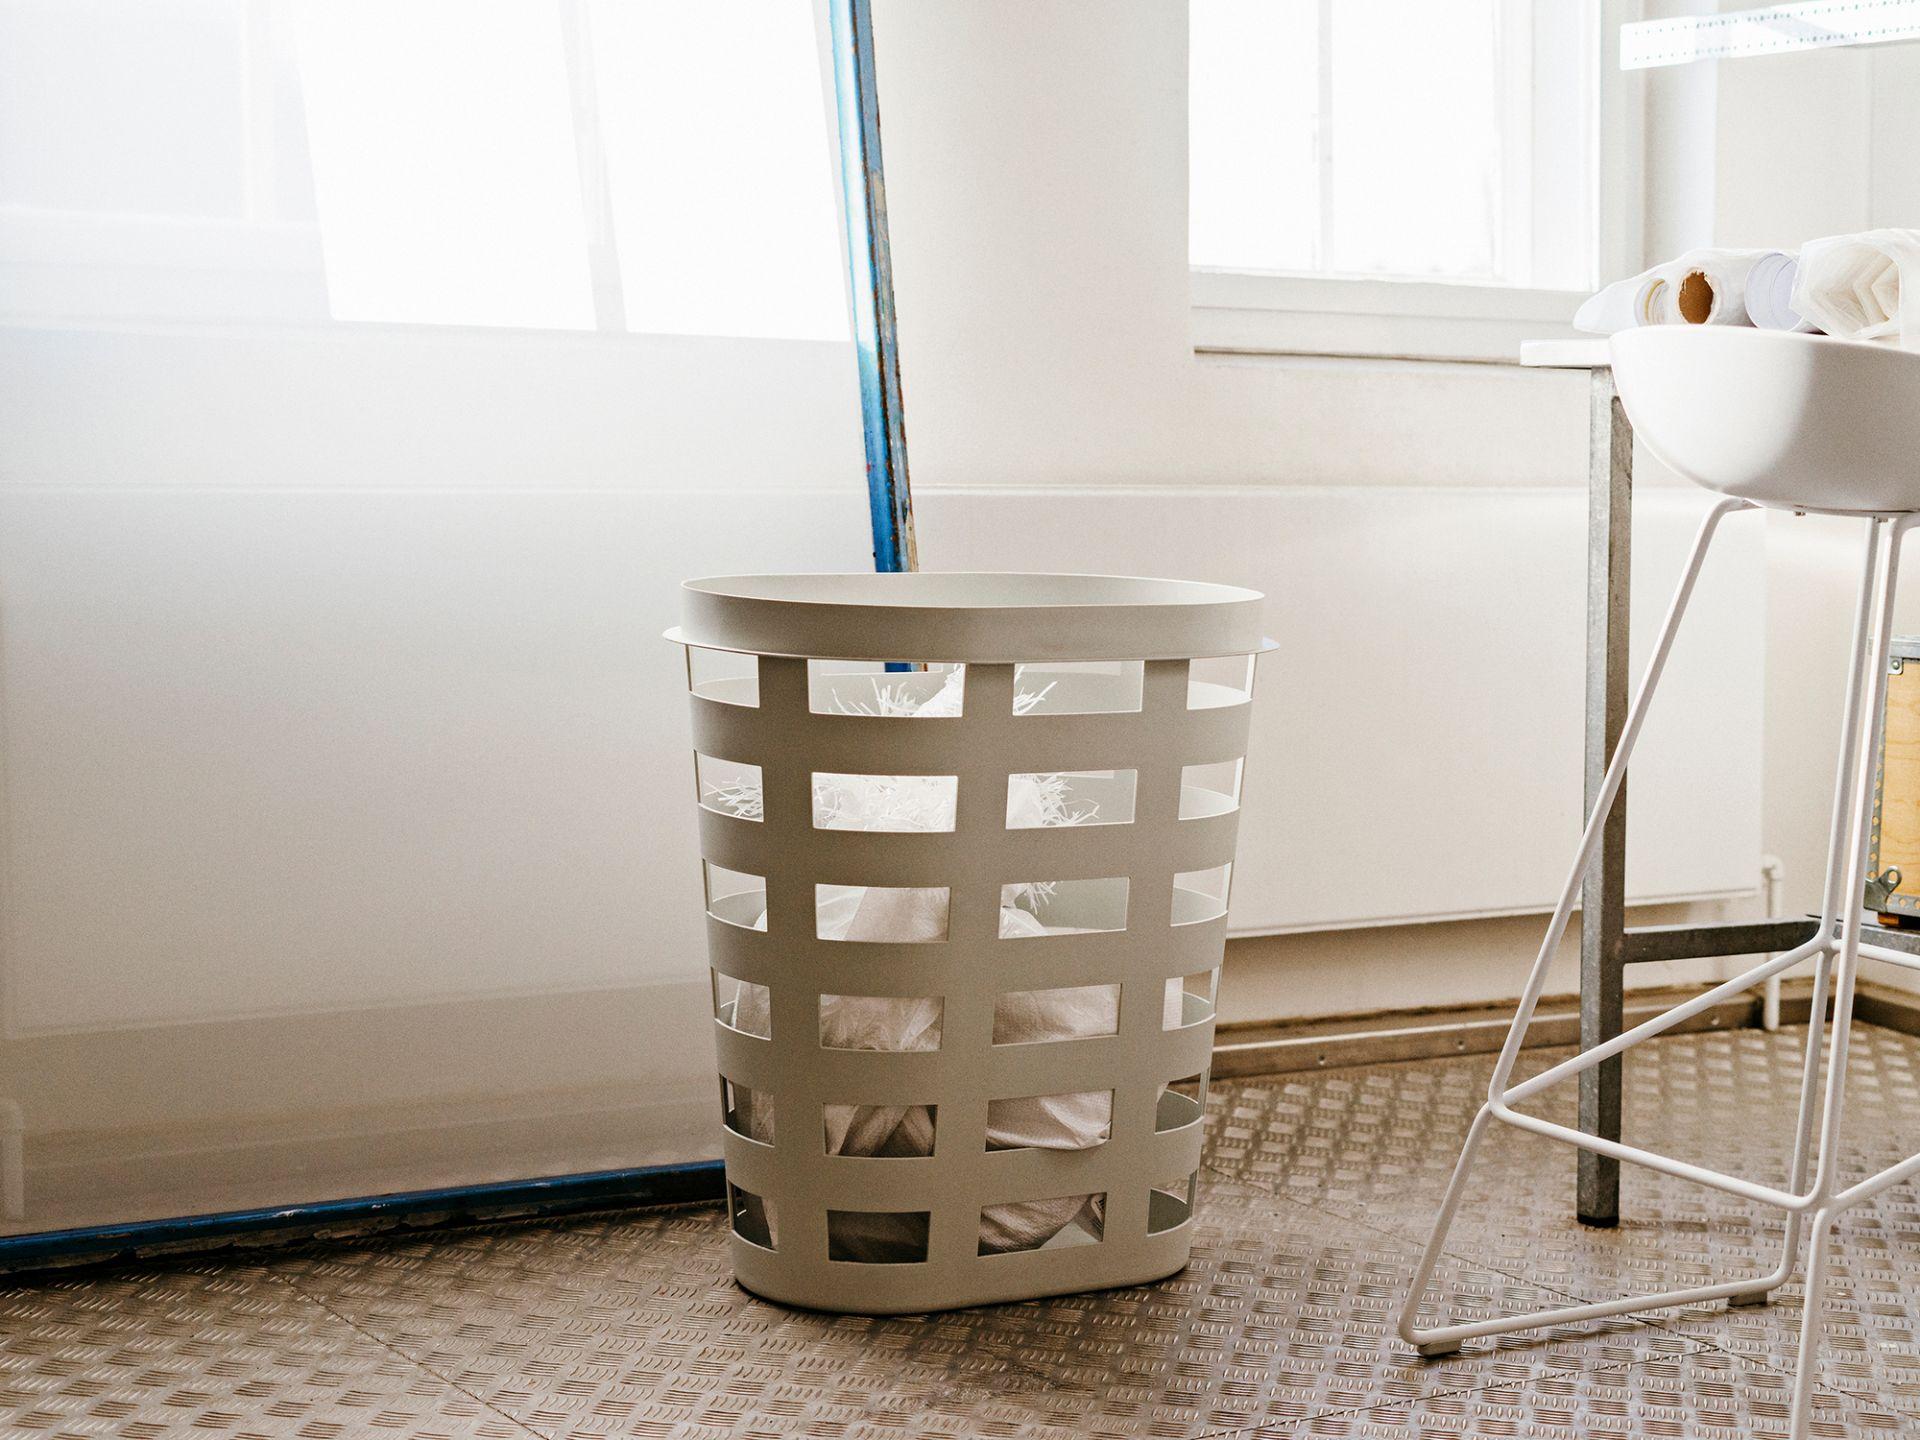 Laundry Basket Wäschekorb L Hay